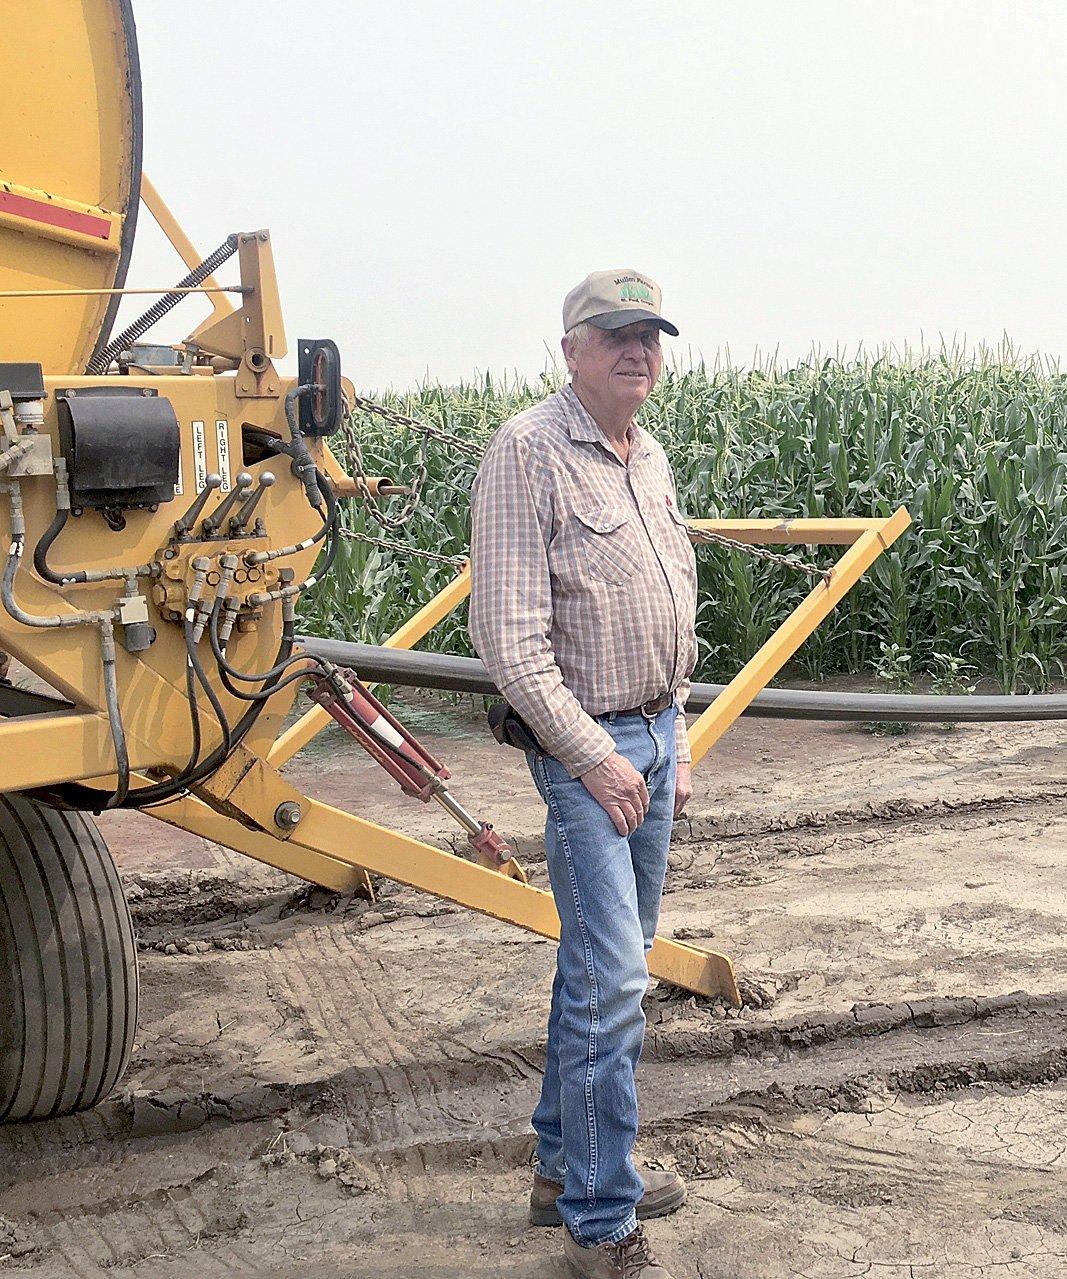 A century of farming